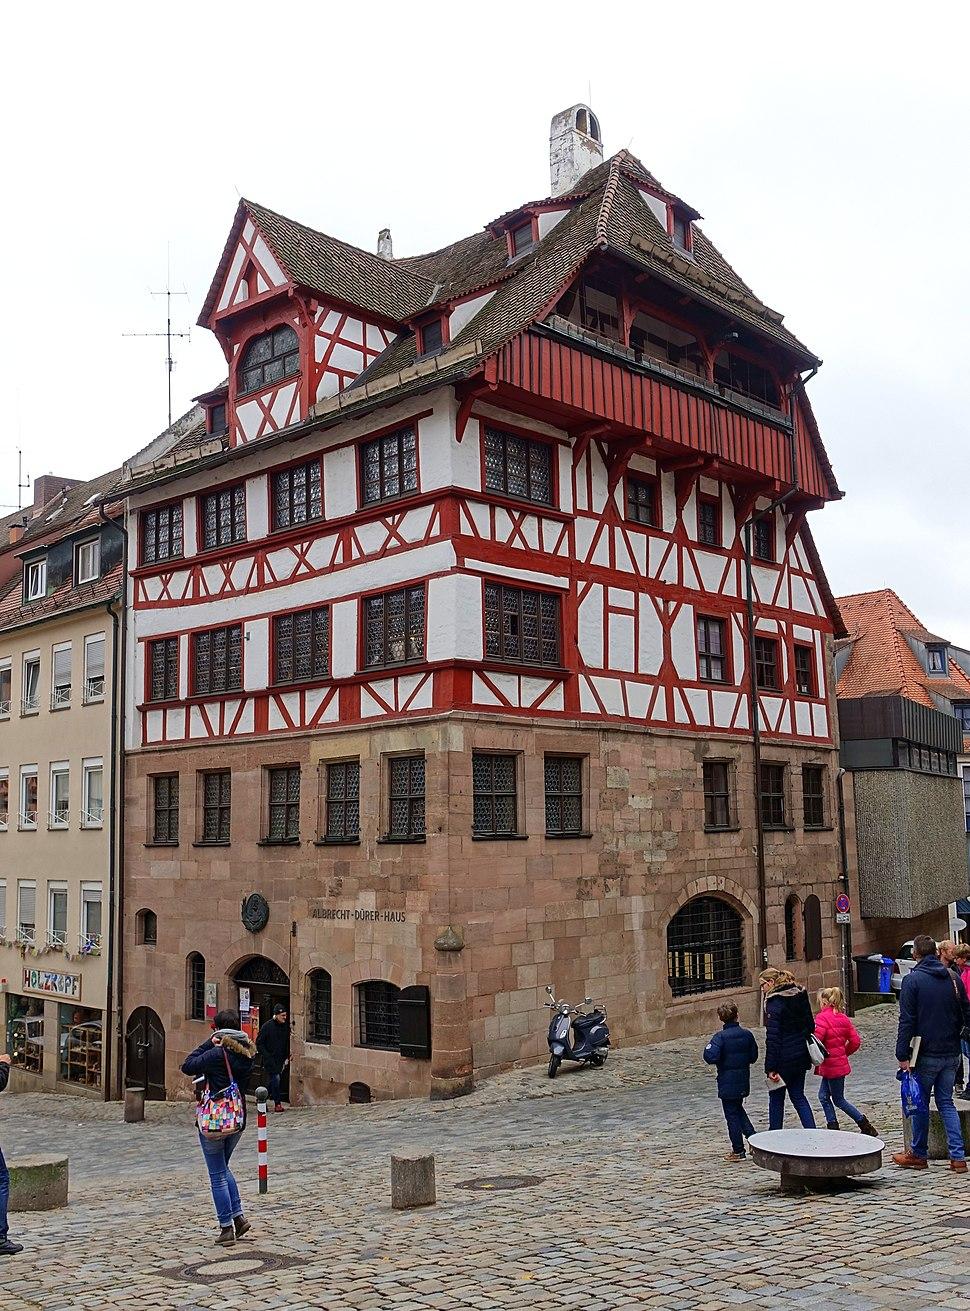 Albrecht-Dürer-Haus - Tiergärtnerplatz - Nuremberg, Germany - DSC02033